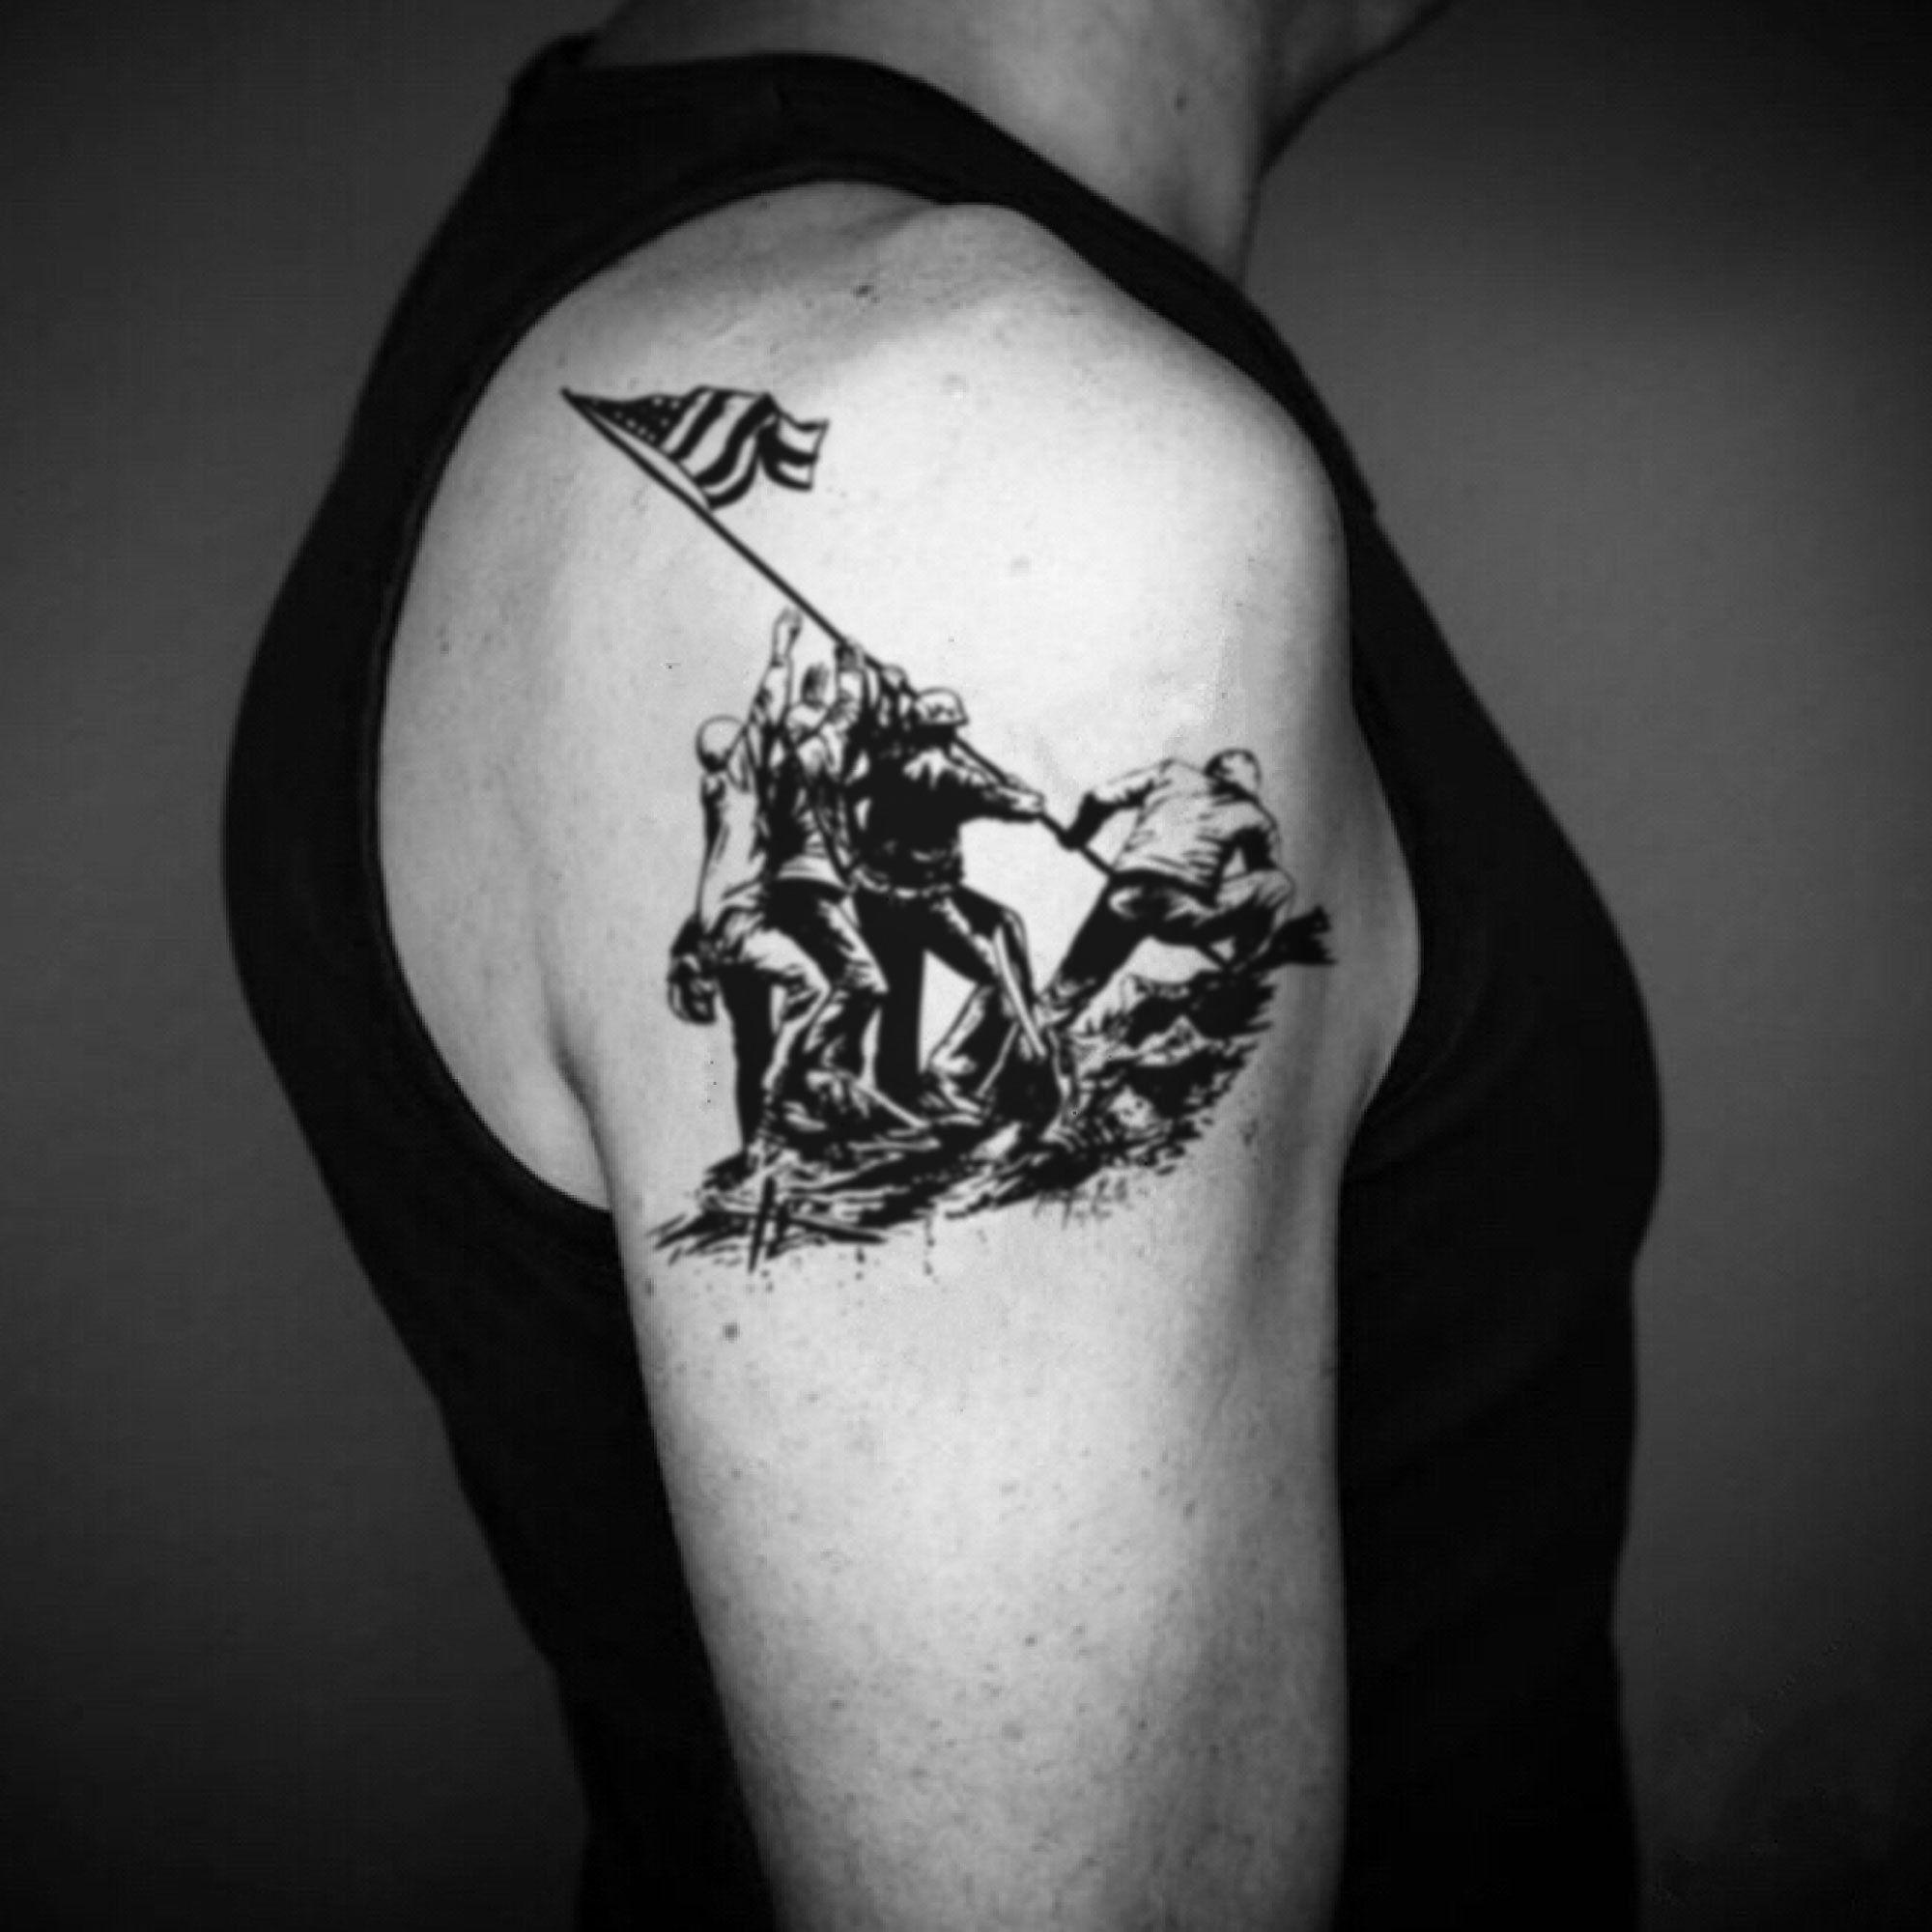 Iwo Jima Flag Raising Temporary Tattoo Sticker (Set of 2